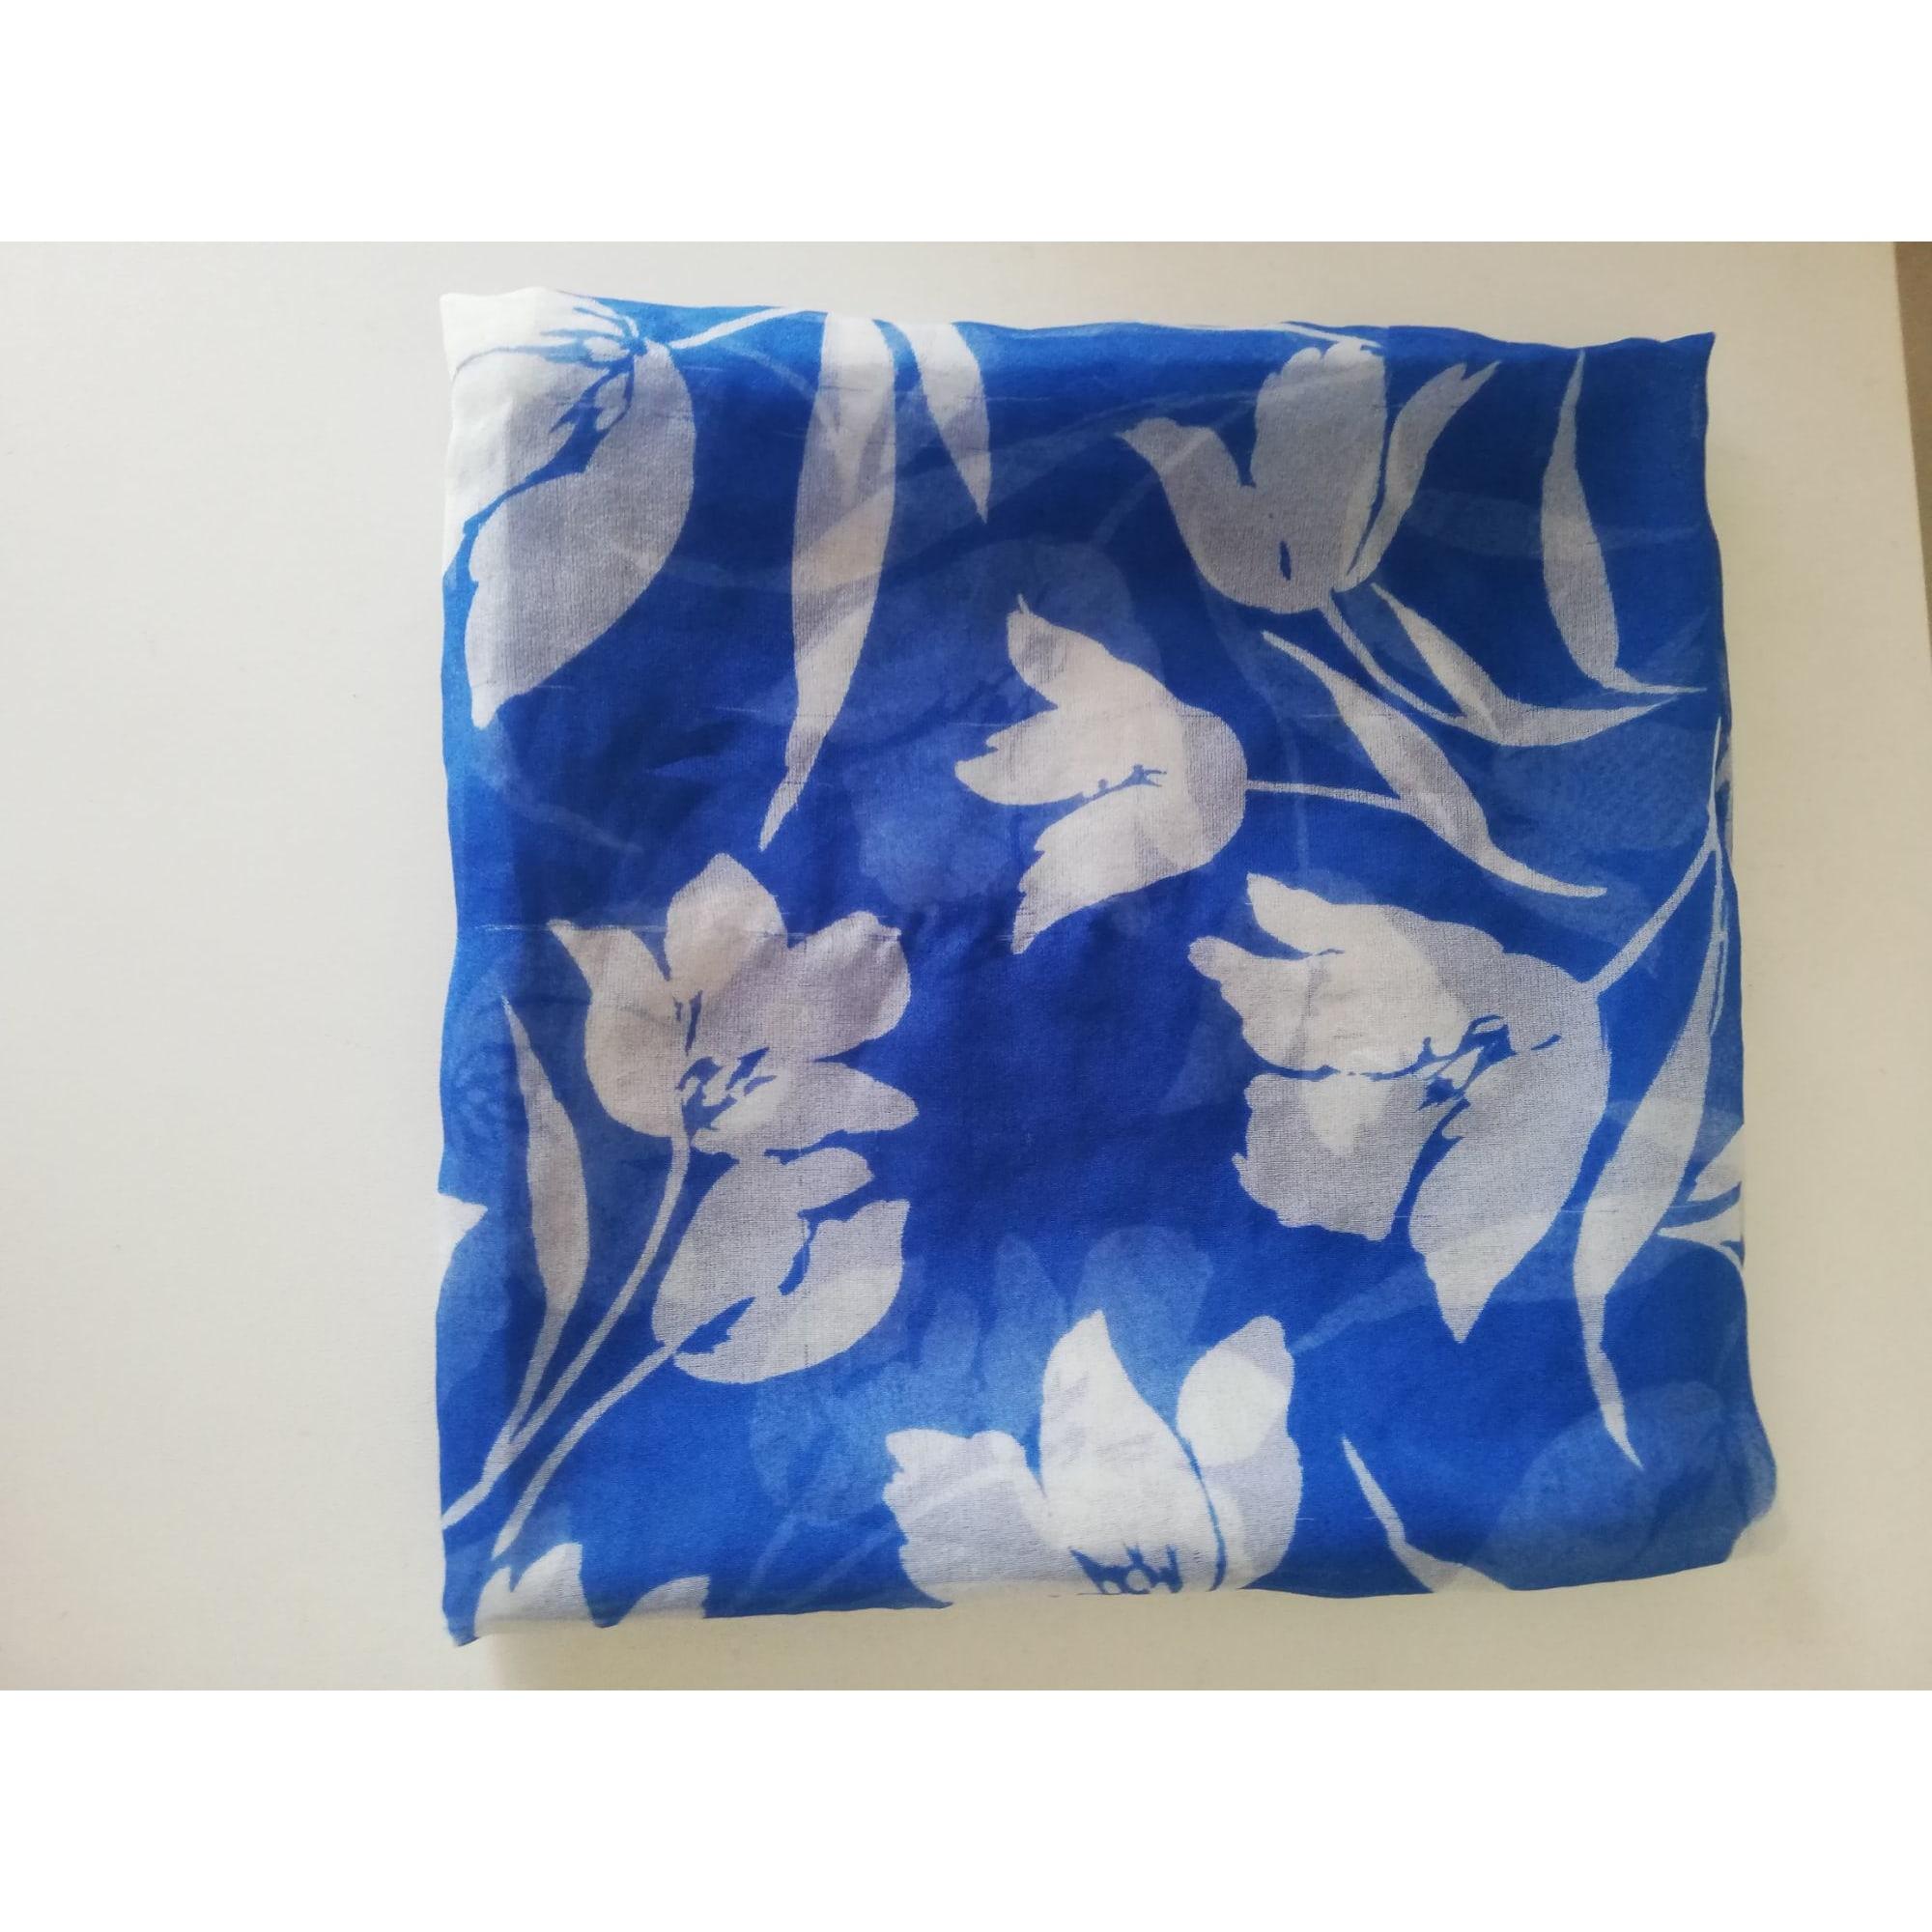 Foulard MARQUE INCONNUE Bleu, bleu marine, bleu turquoise